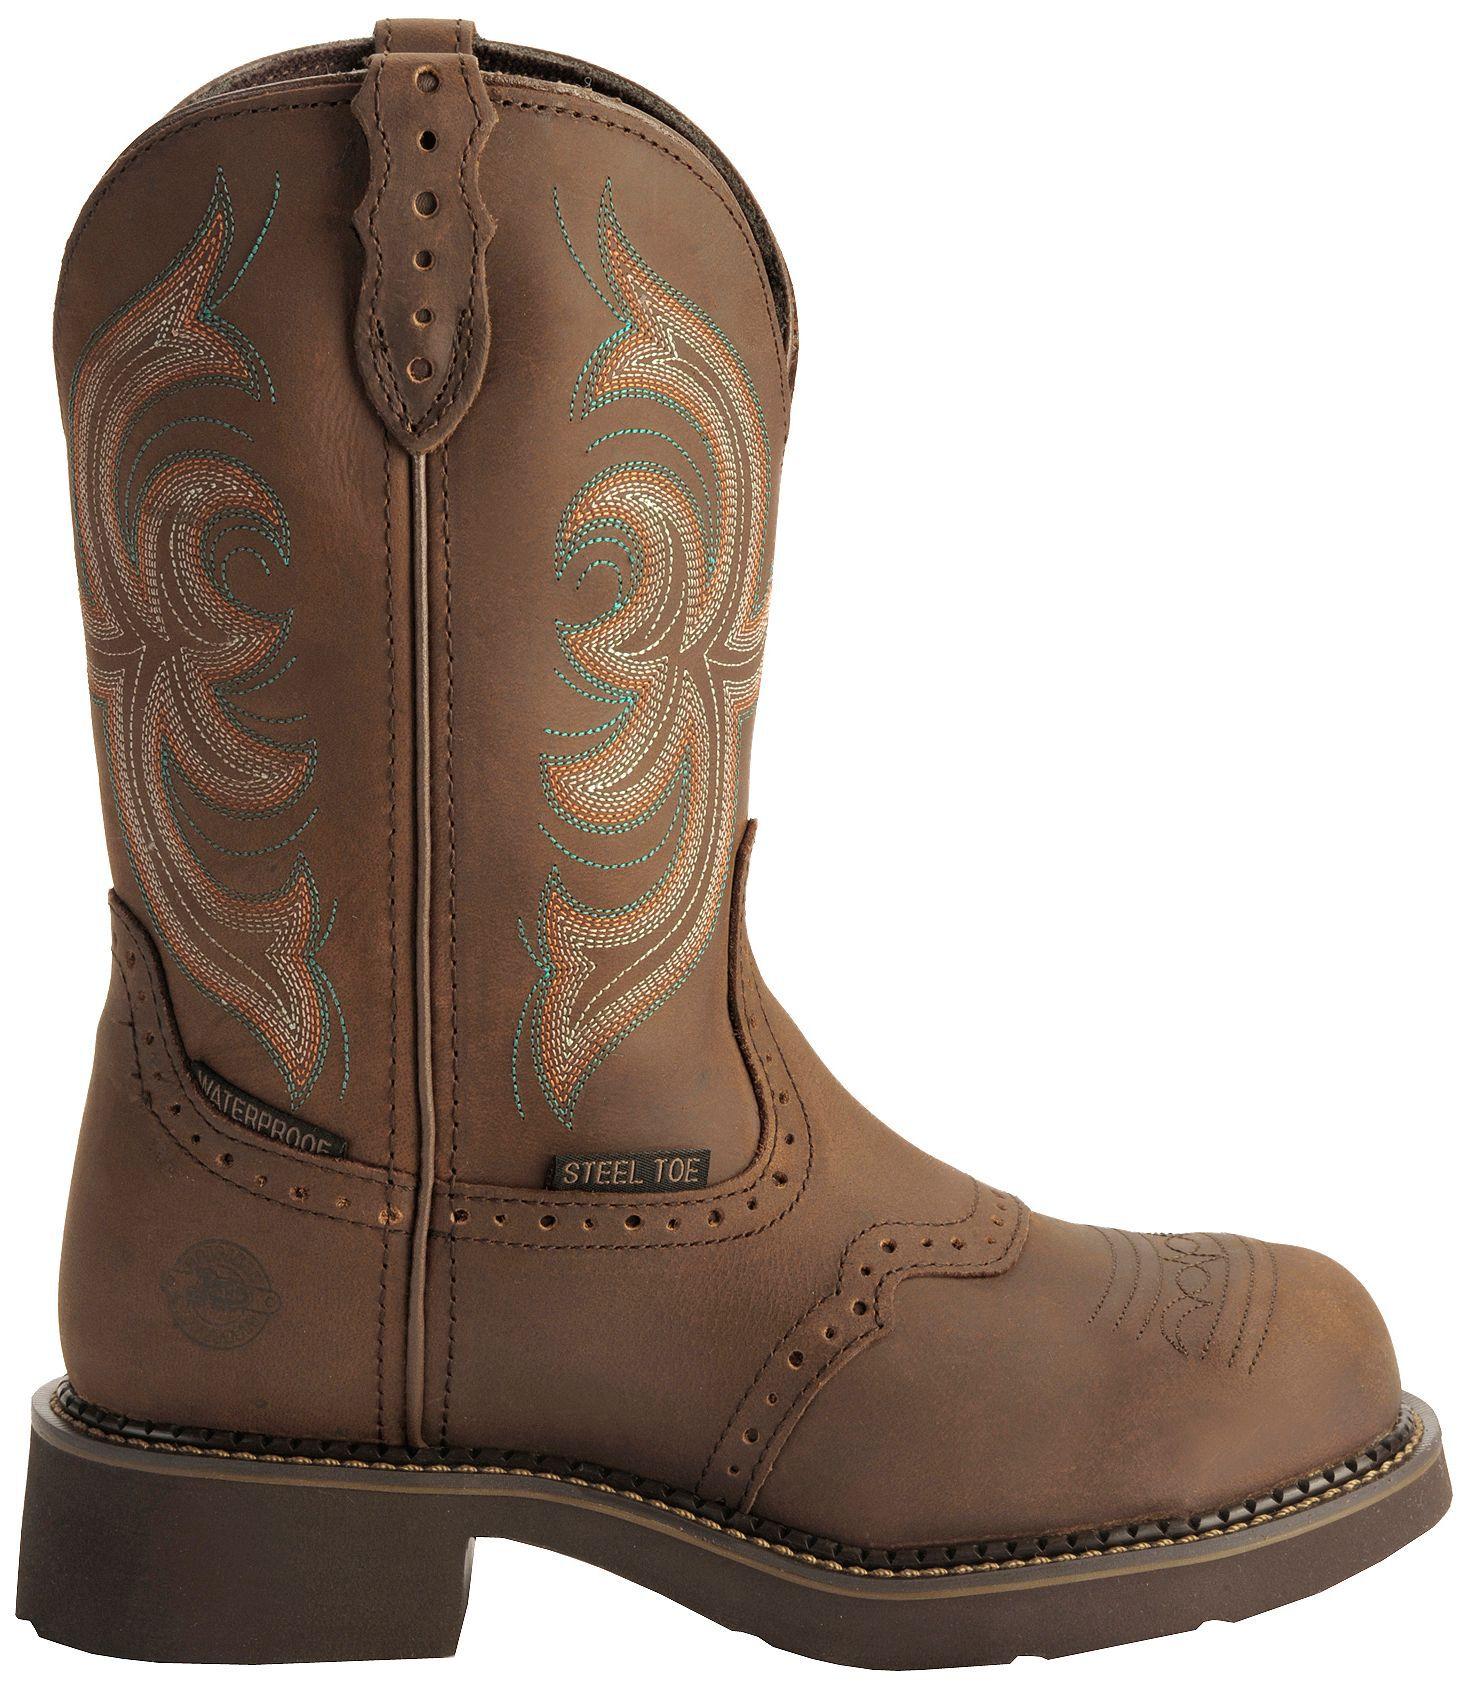 Brown EH Work Boots - Steel Toe